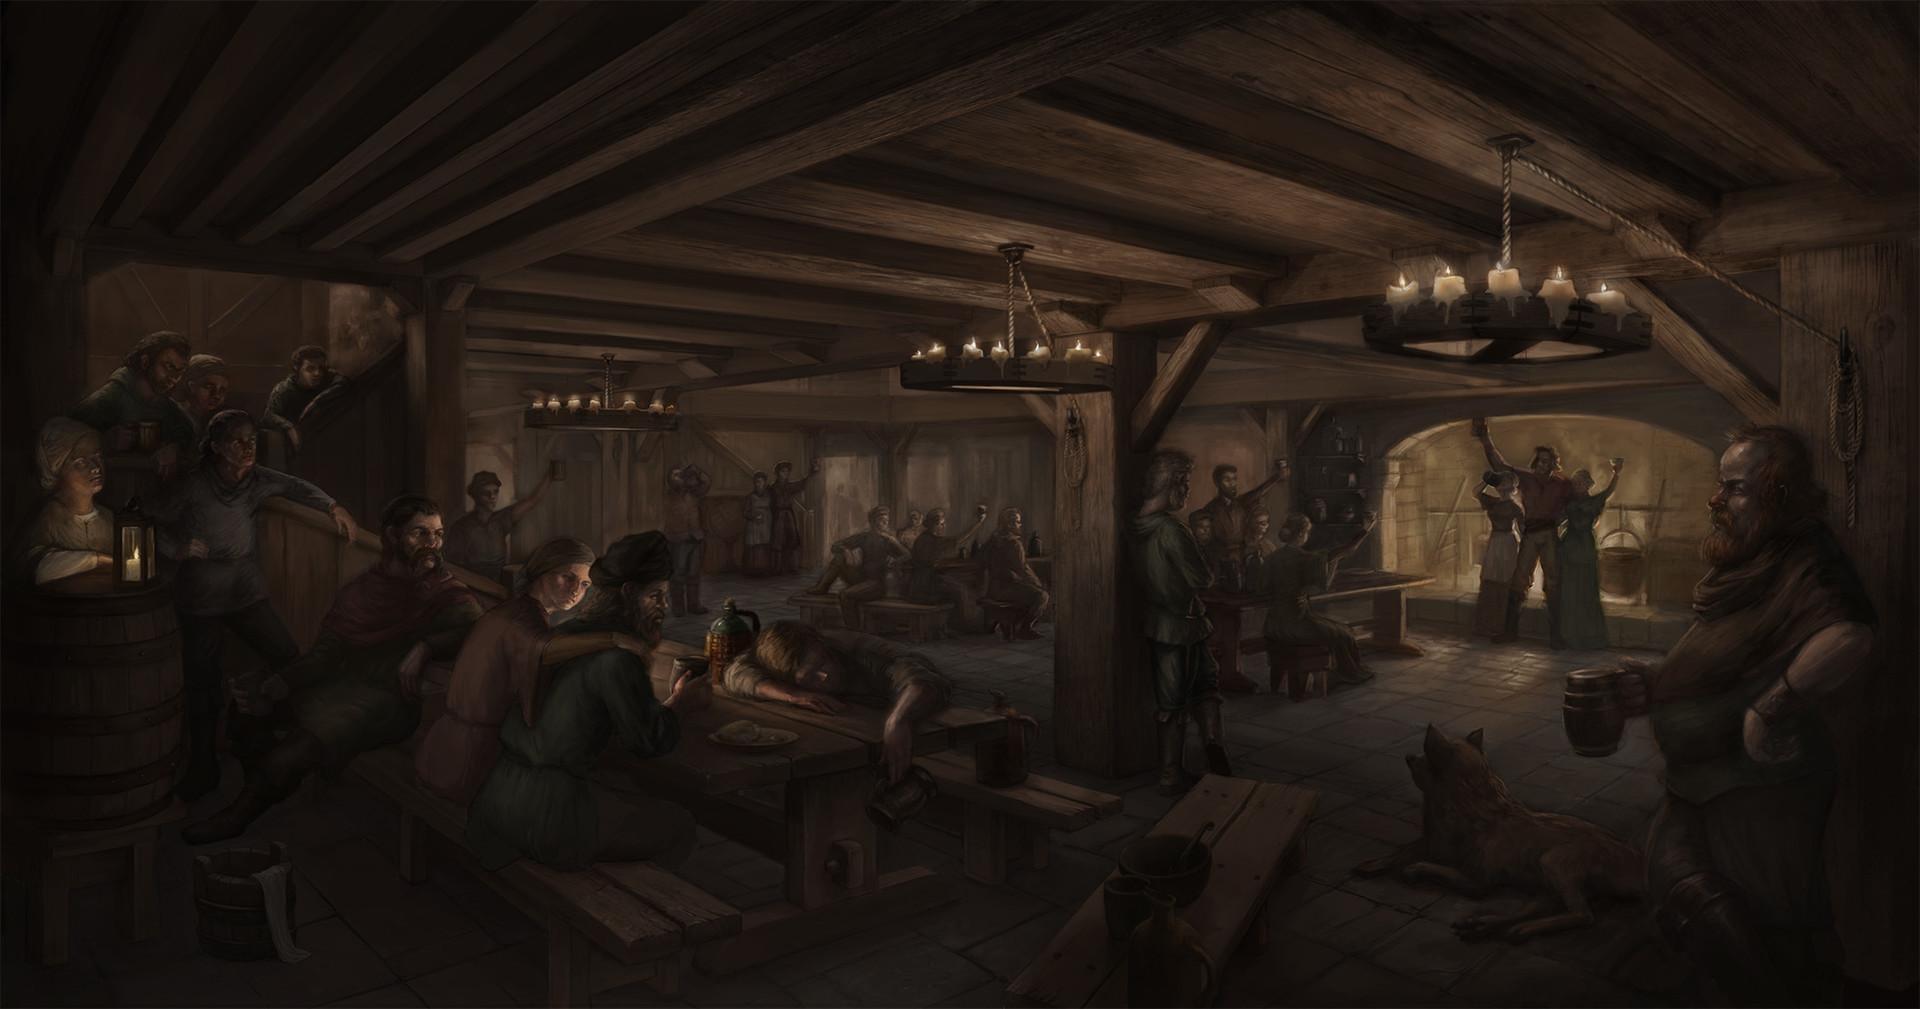 Final render in full color